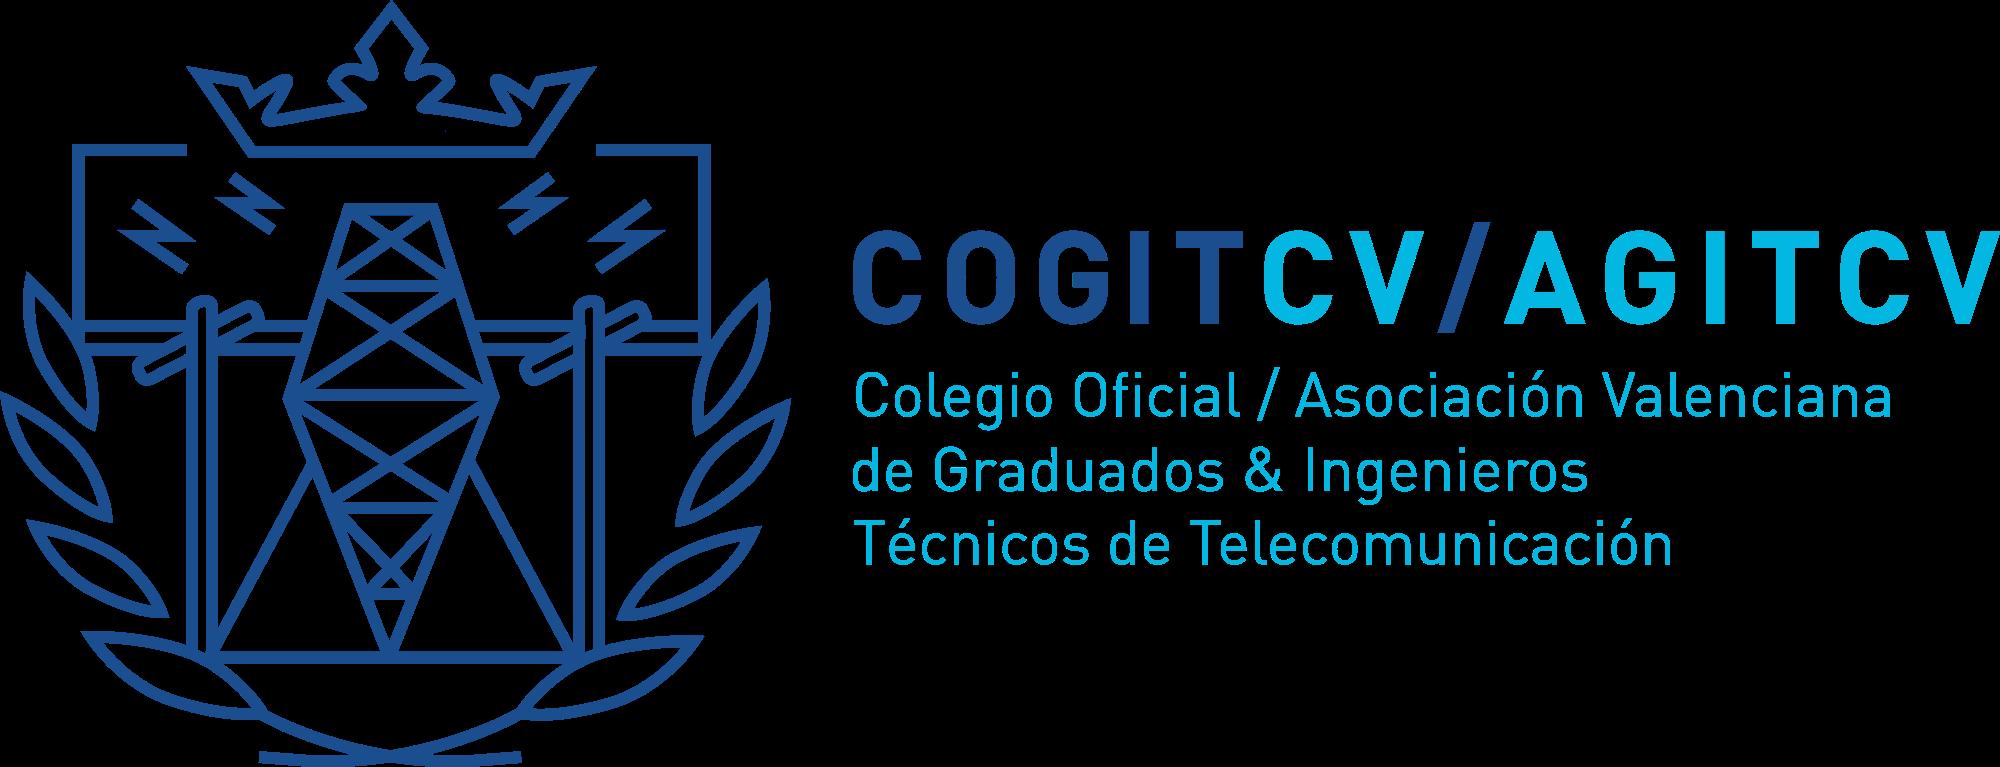 Logo cogitcv agitcv